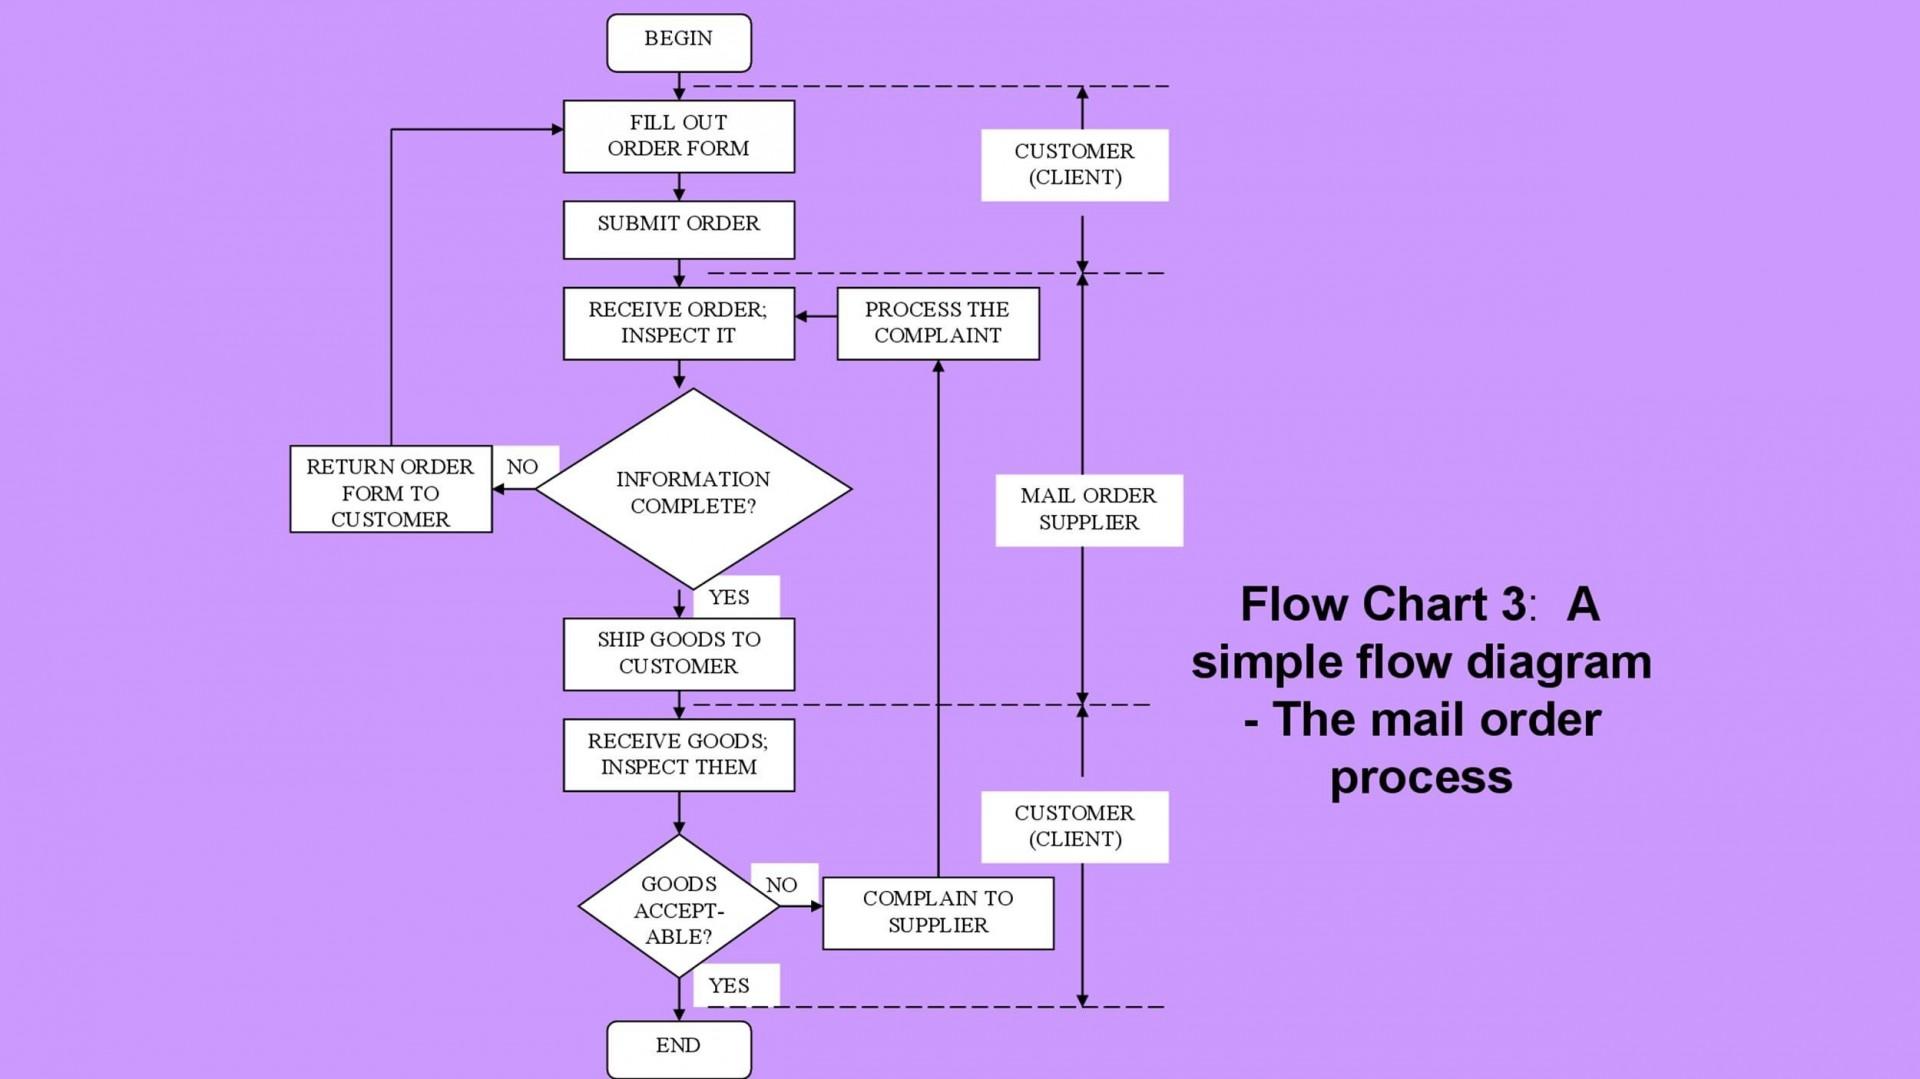 006 Singular Free Flowchart Template Word High Definition  Proces Microsoft1920